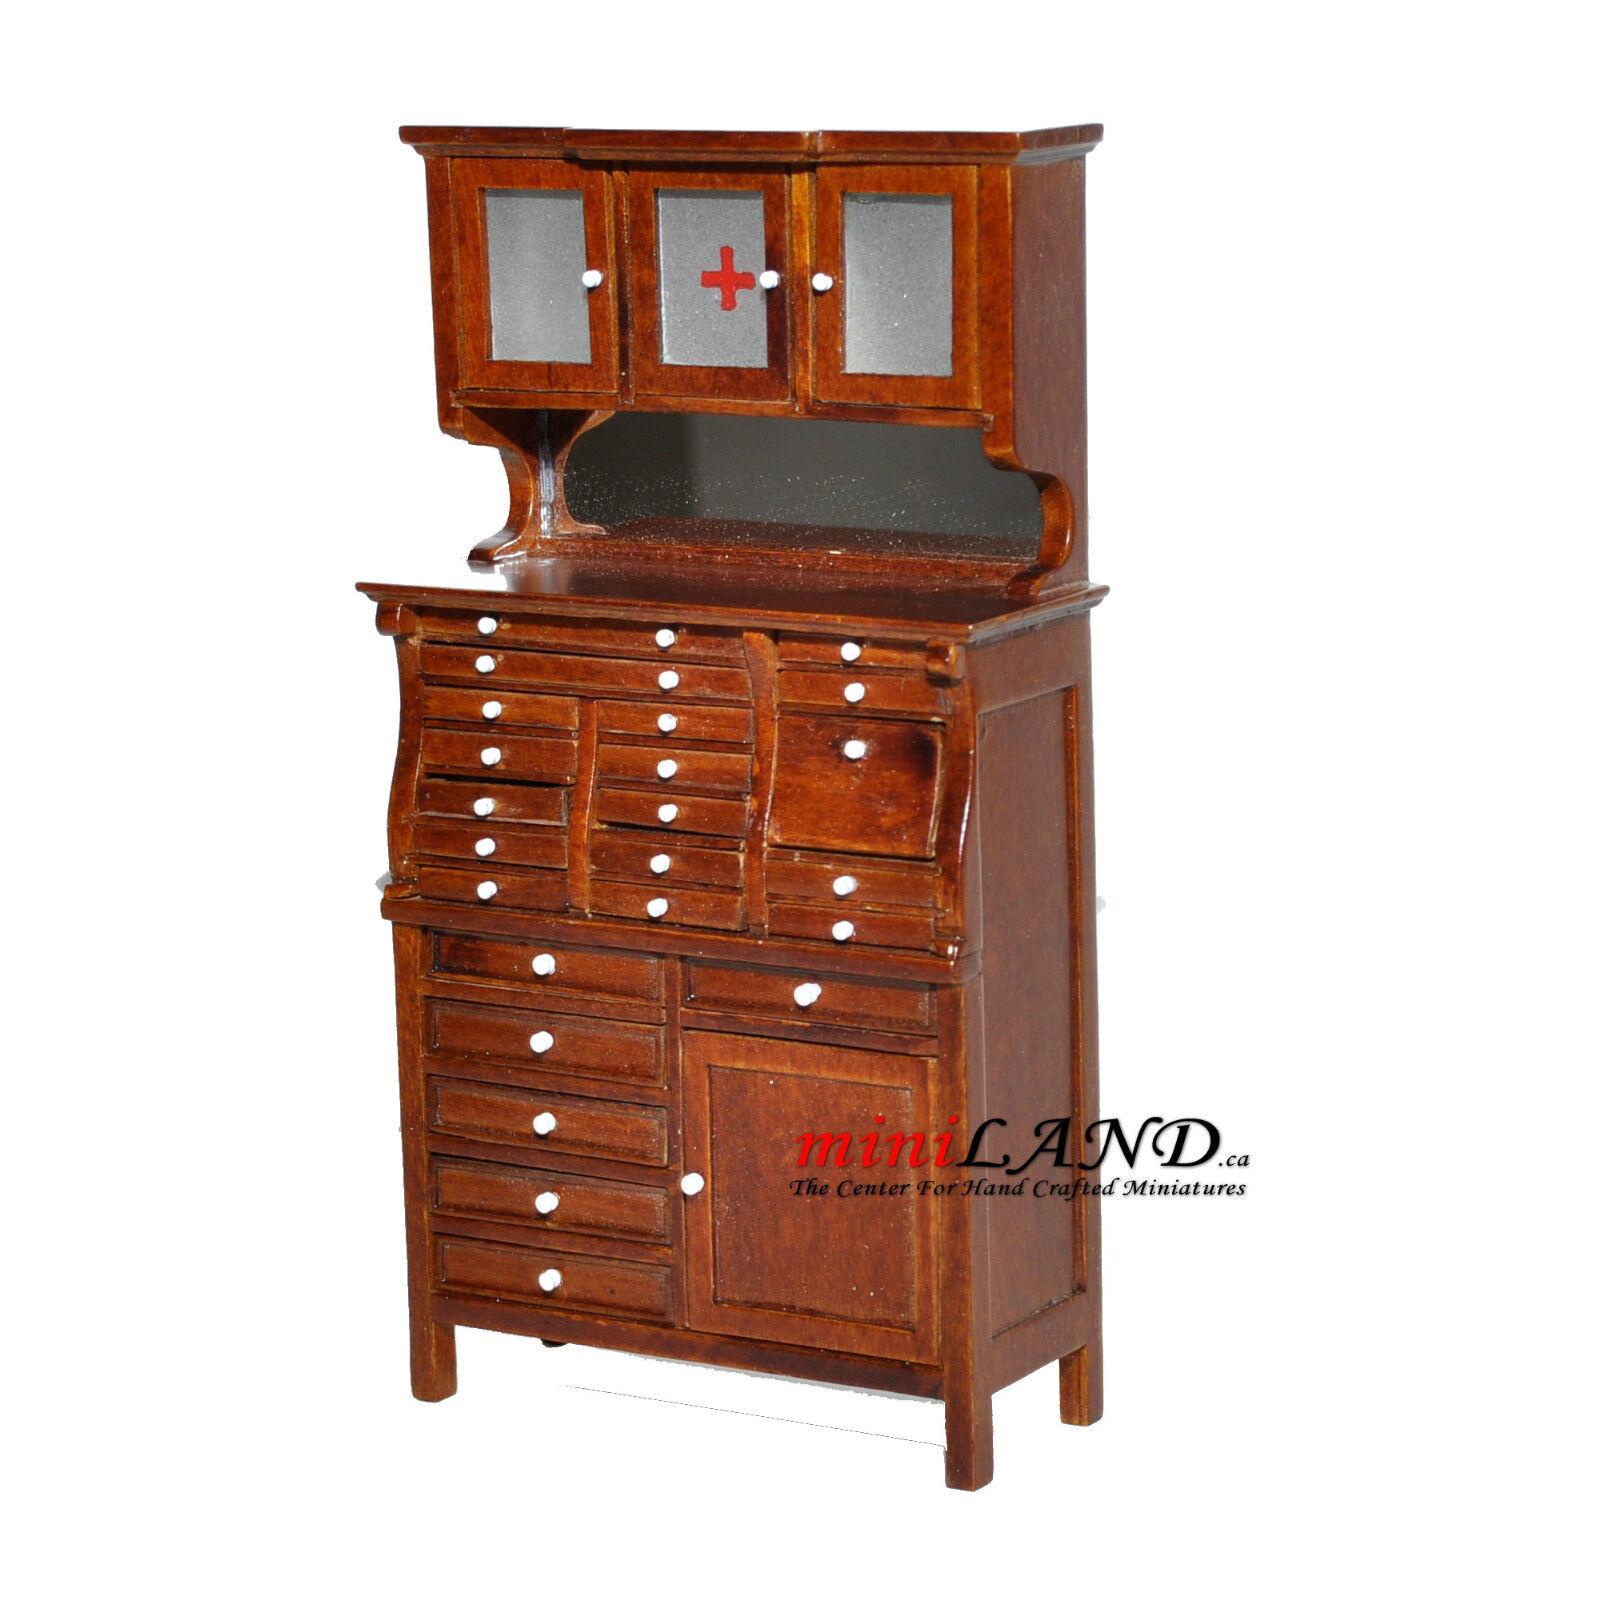 Medical doctor dentist cabinet Fine Quality Dollhouse miniature 1:12 walnut